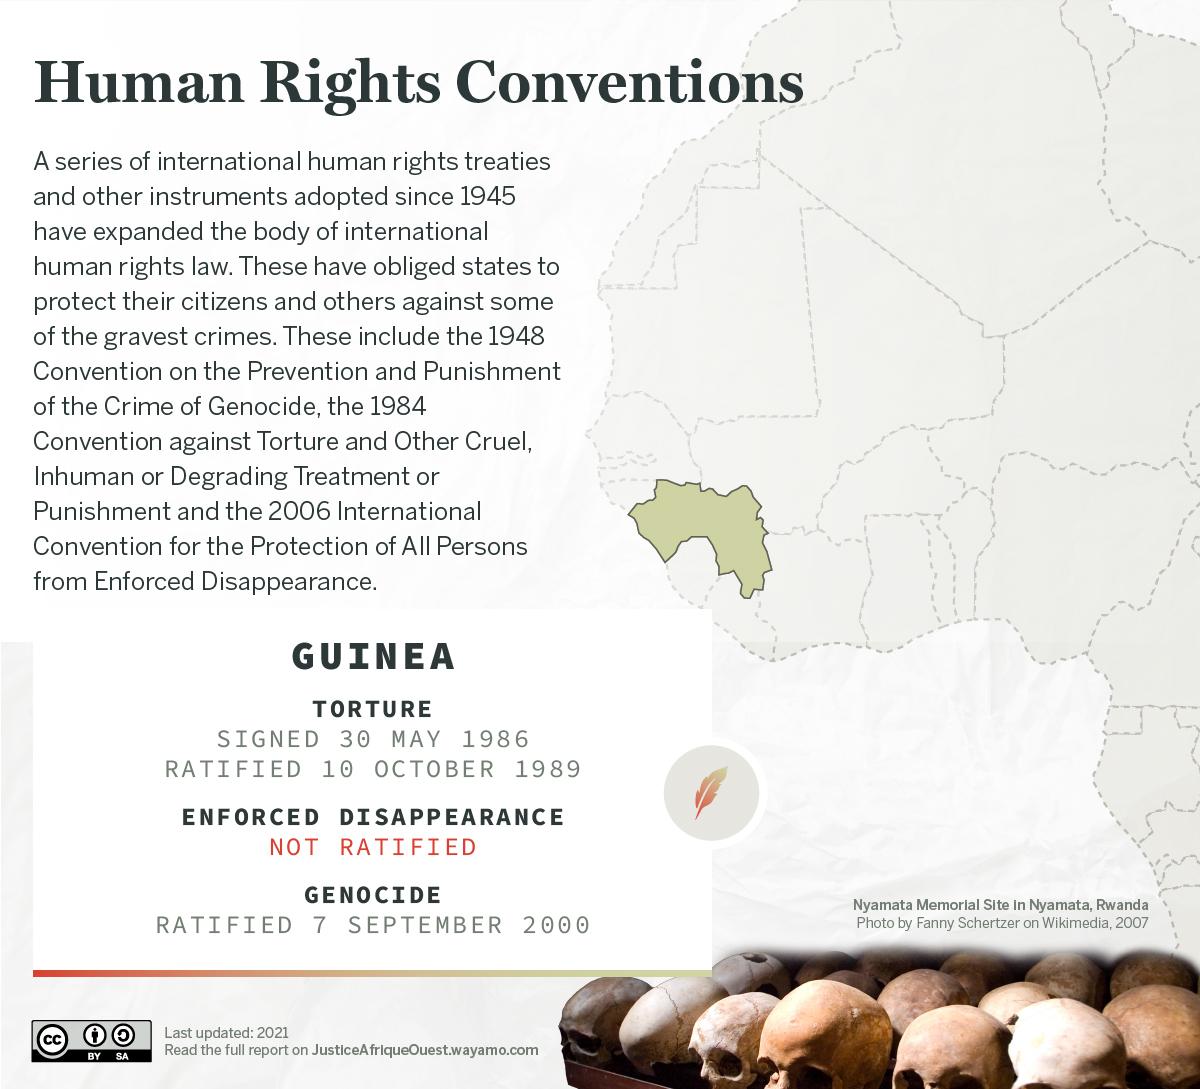 __GUINEA_Human Rights Conventions_1 - Wayamo Foundation (CC BY-SA 4.0)